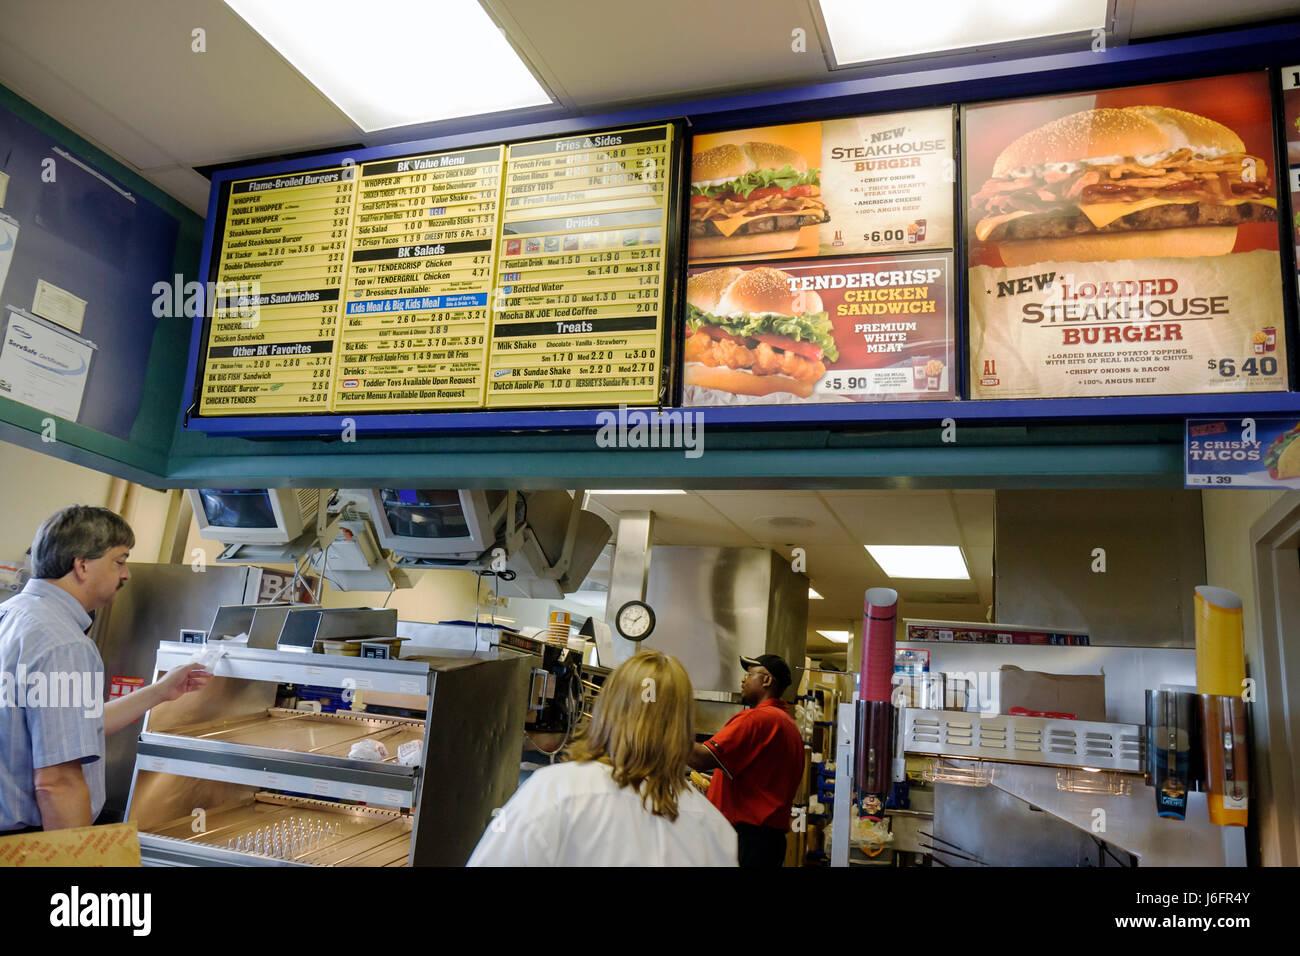 Wisconsin Kenosha Burger King fast food hamburger restaurant chain franchise menu choice Black man men woman counter - Stock Image